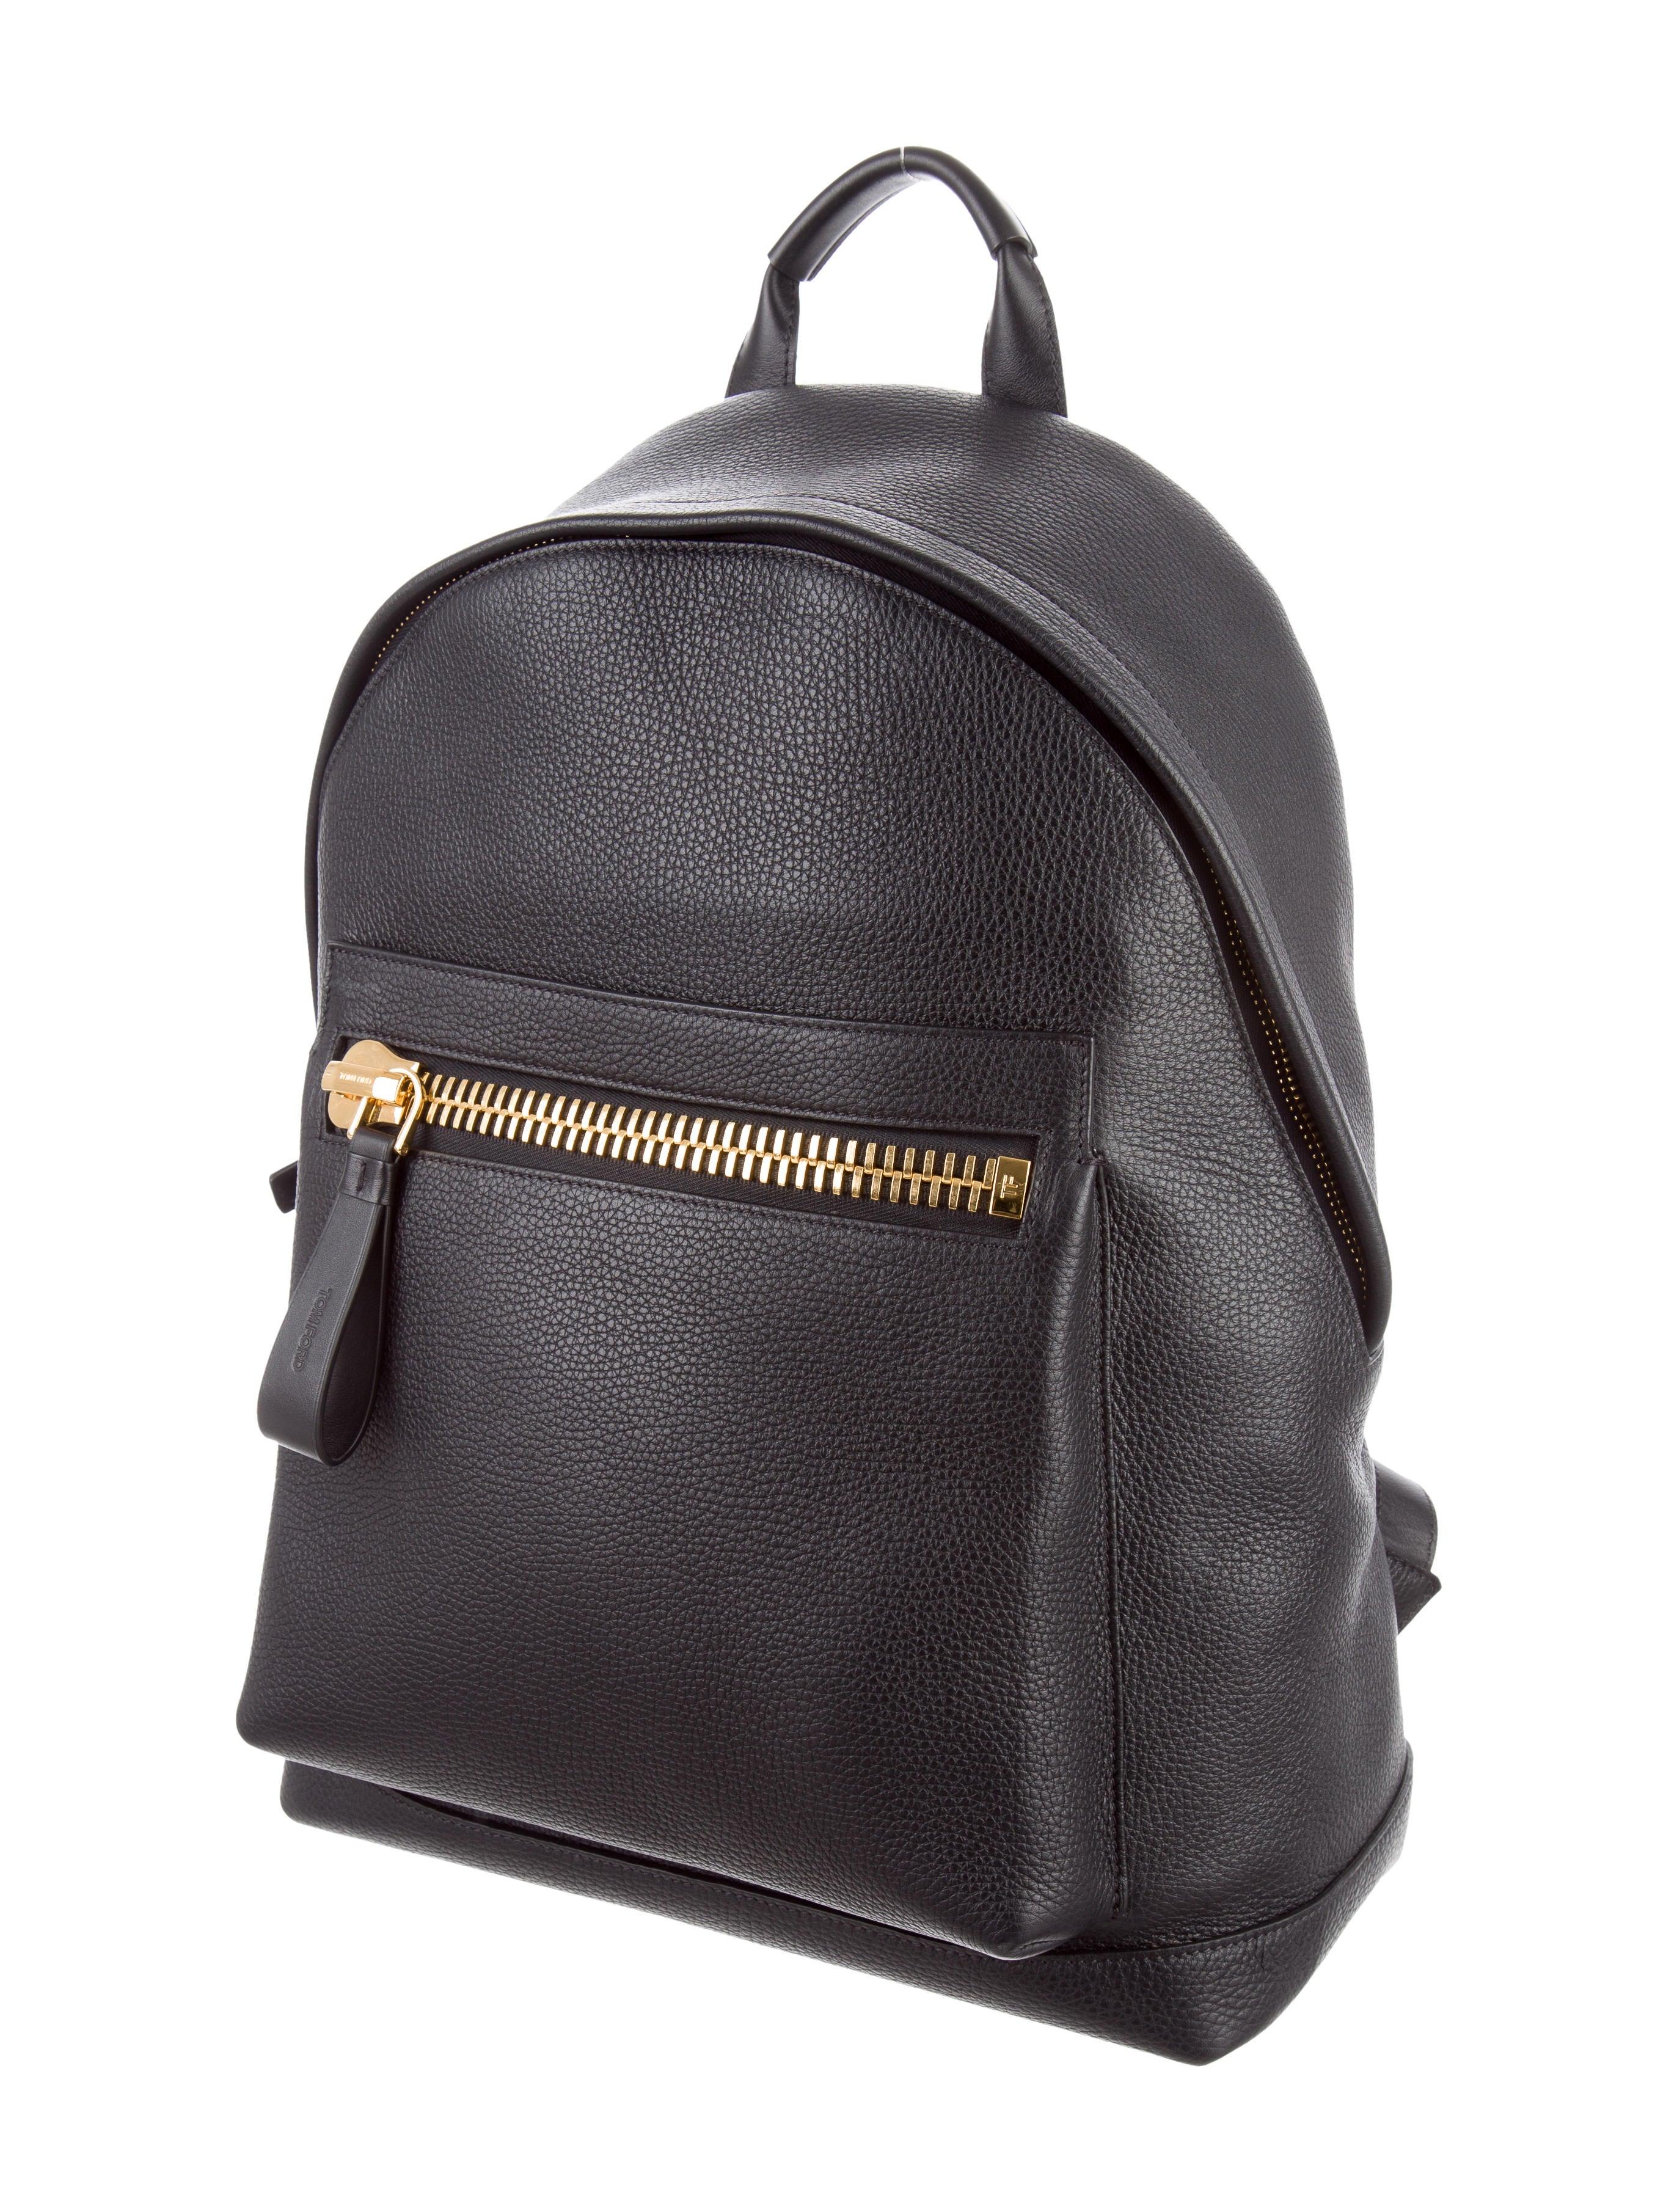 tom ford leather buckley backpack bags tom36553 the. Black Bedroom Furniture Sets. Home Design Ideas